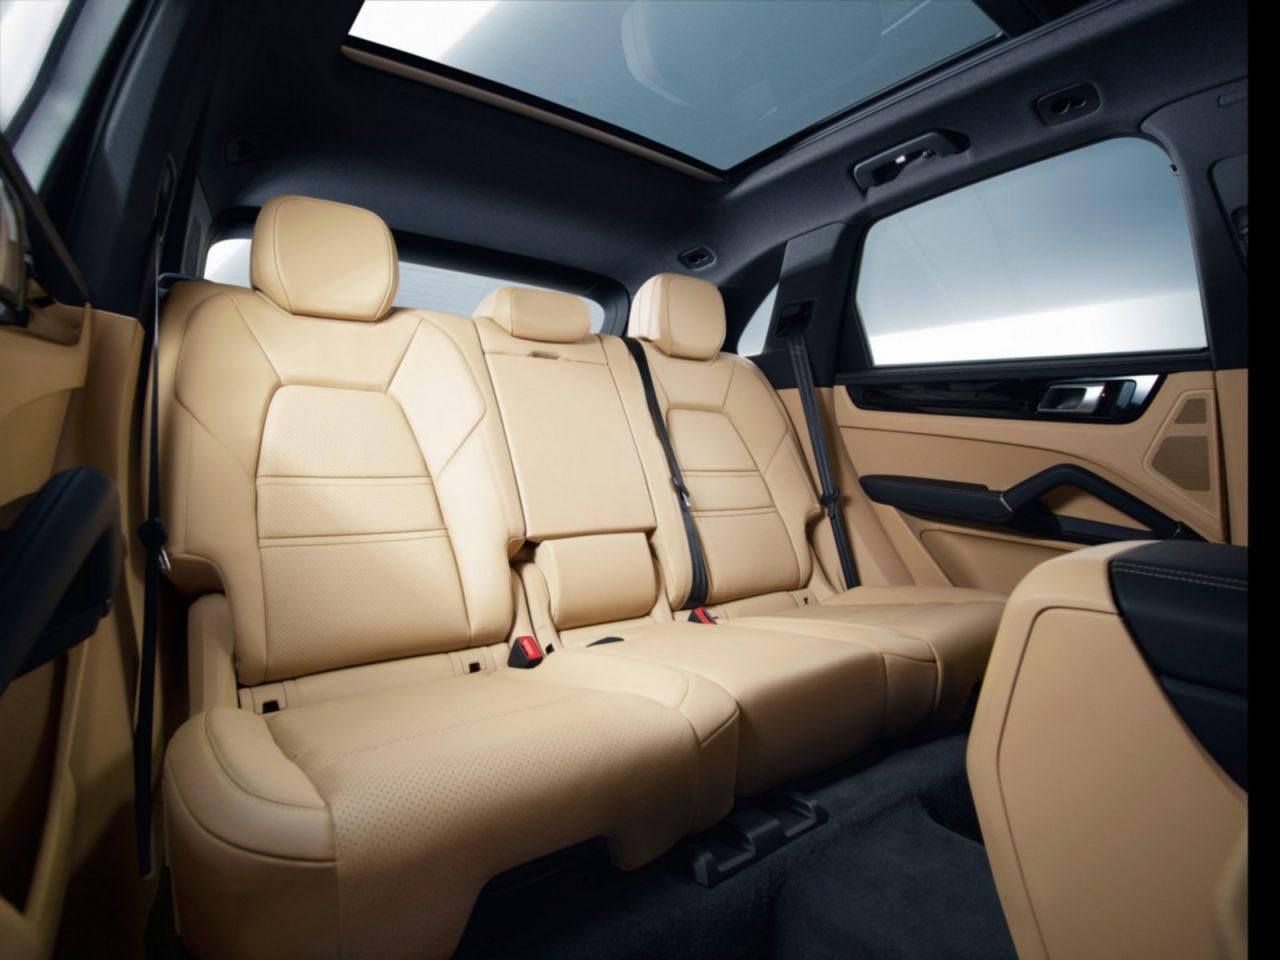 porsche panamera interior back seat. 2018 porsche cayennerear seats panamera interior back seat